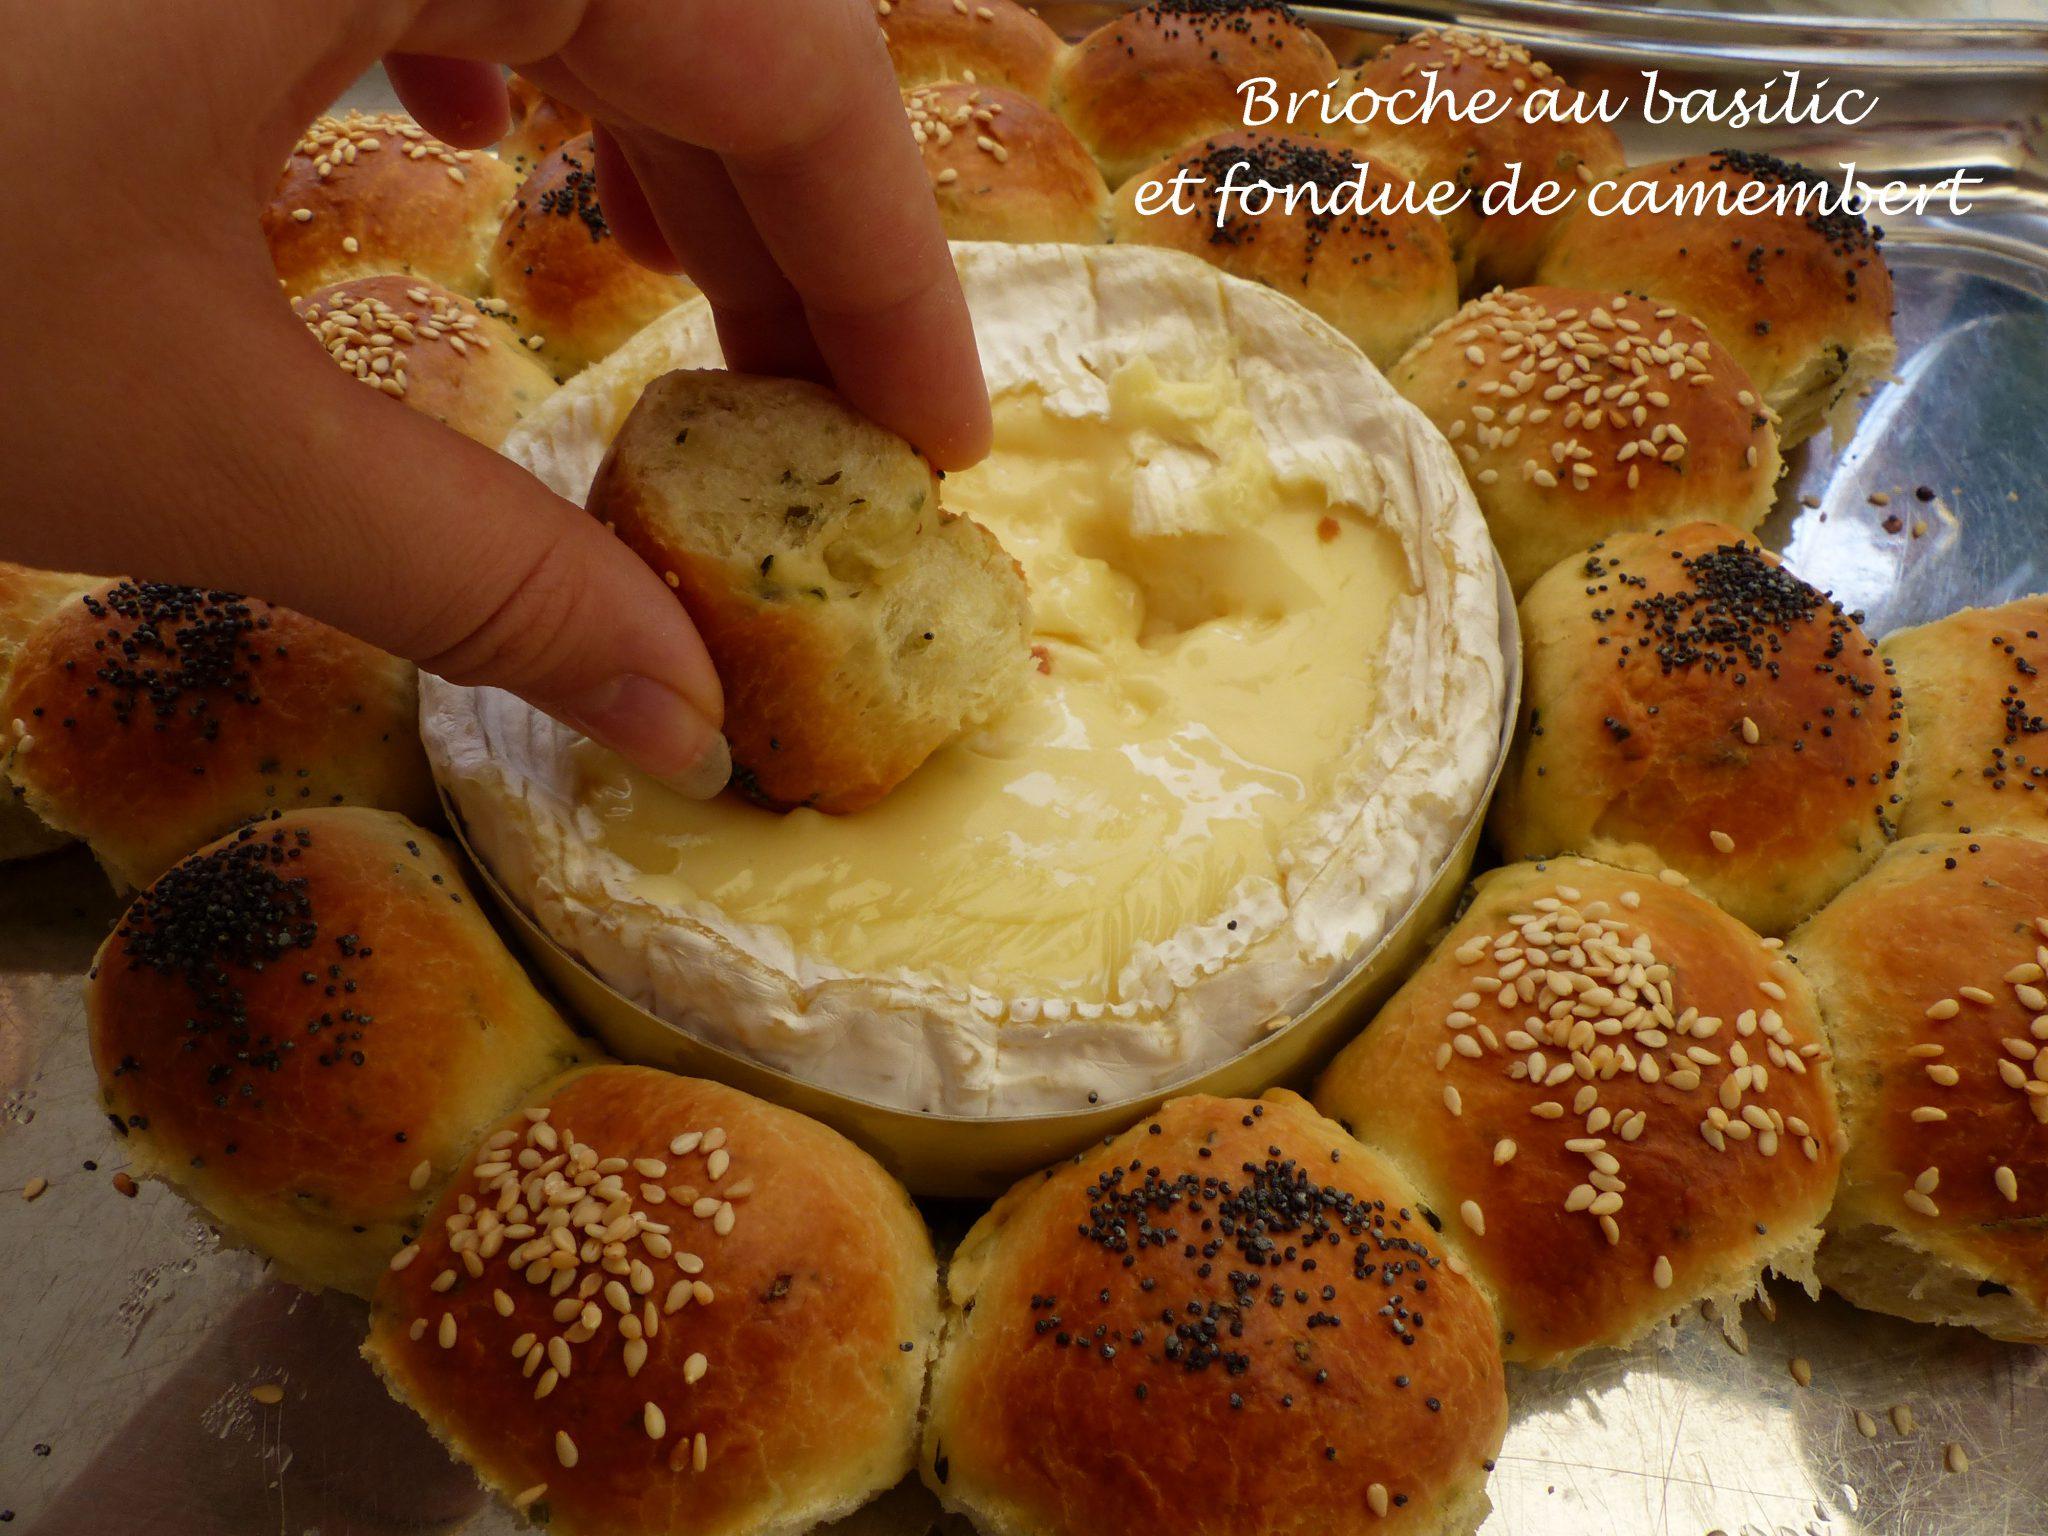 Brioche au basilic et fondue de camembert P1130155 R